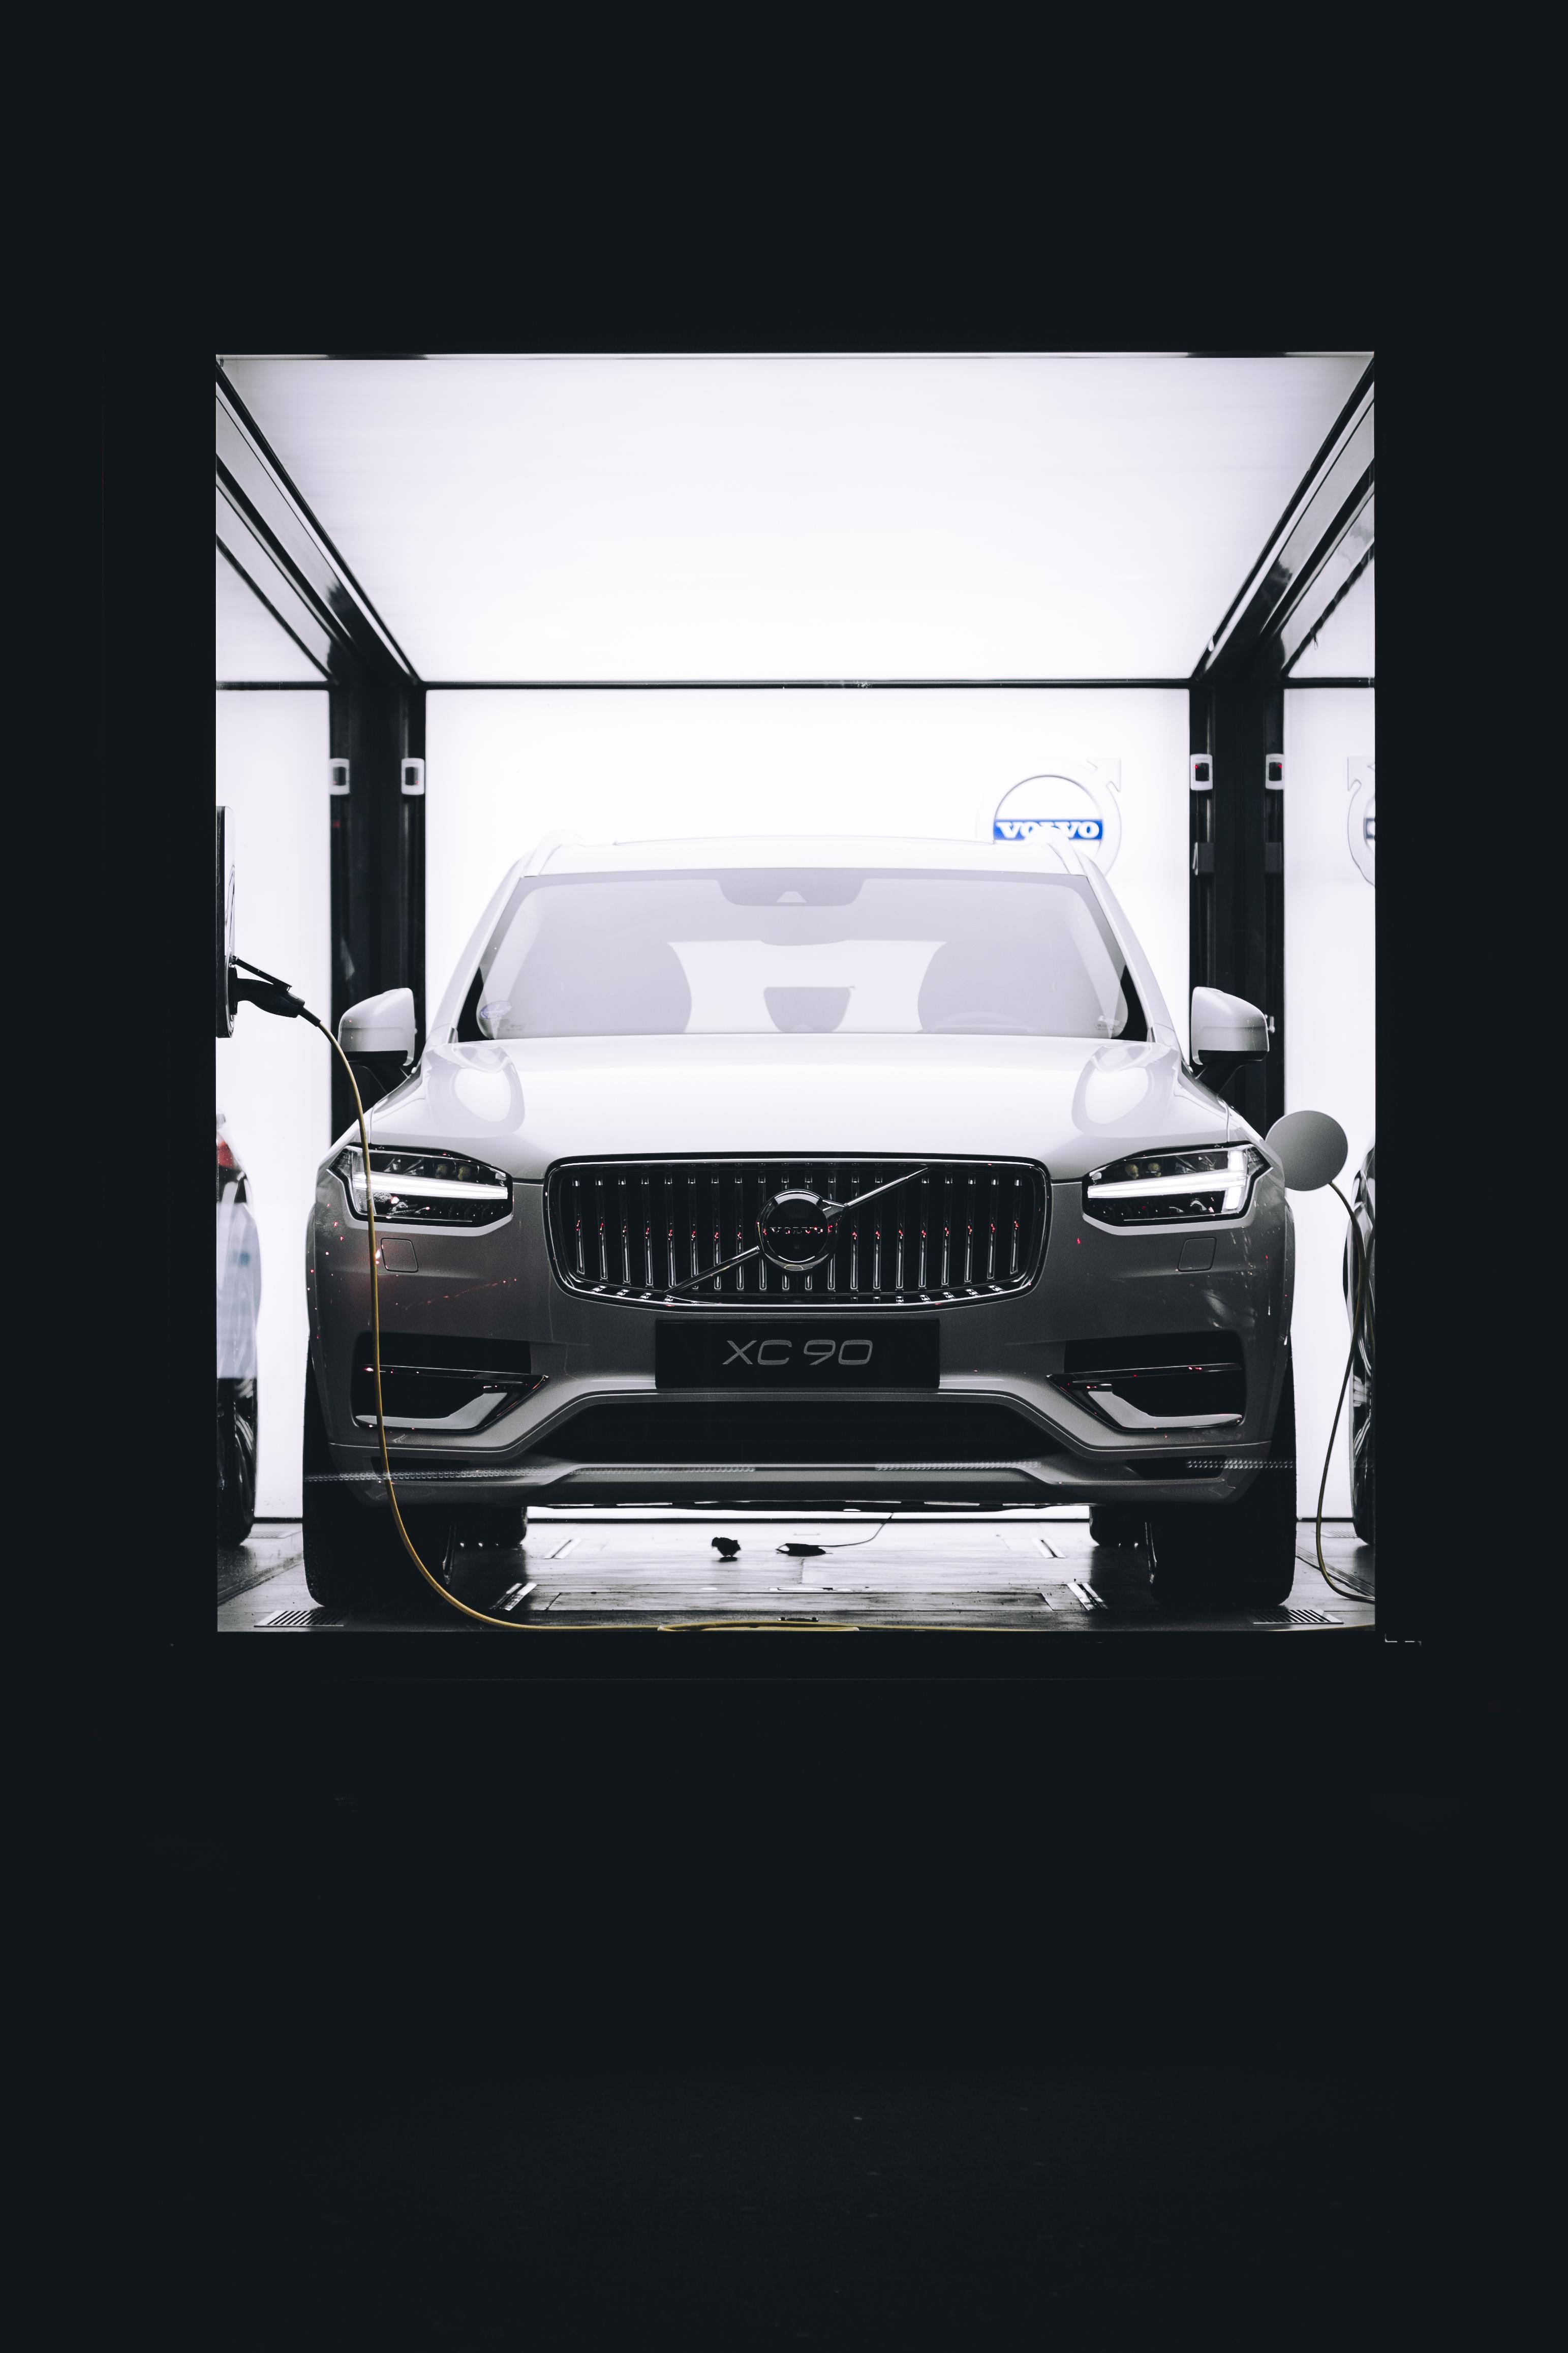 Car photography by Maxime Horlaville - MxHpics